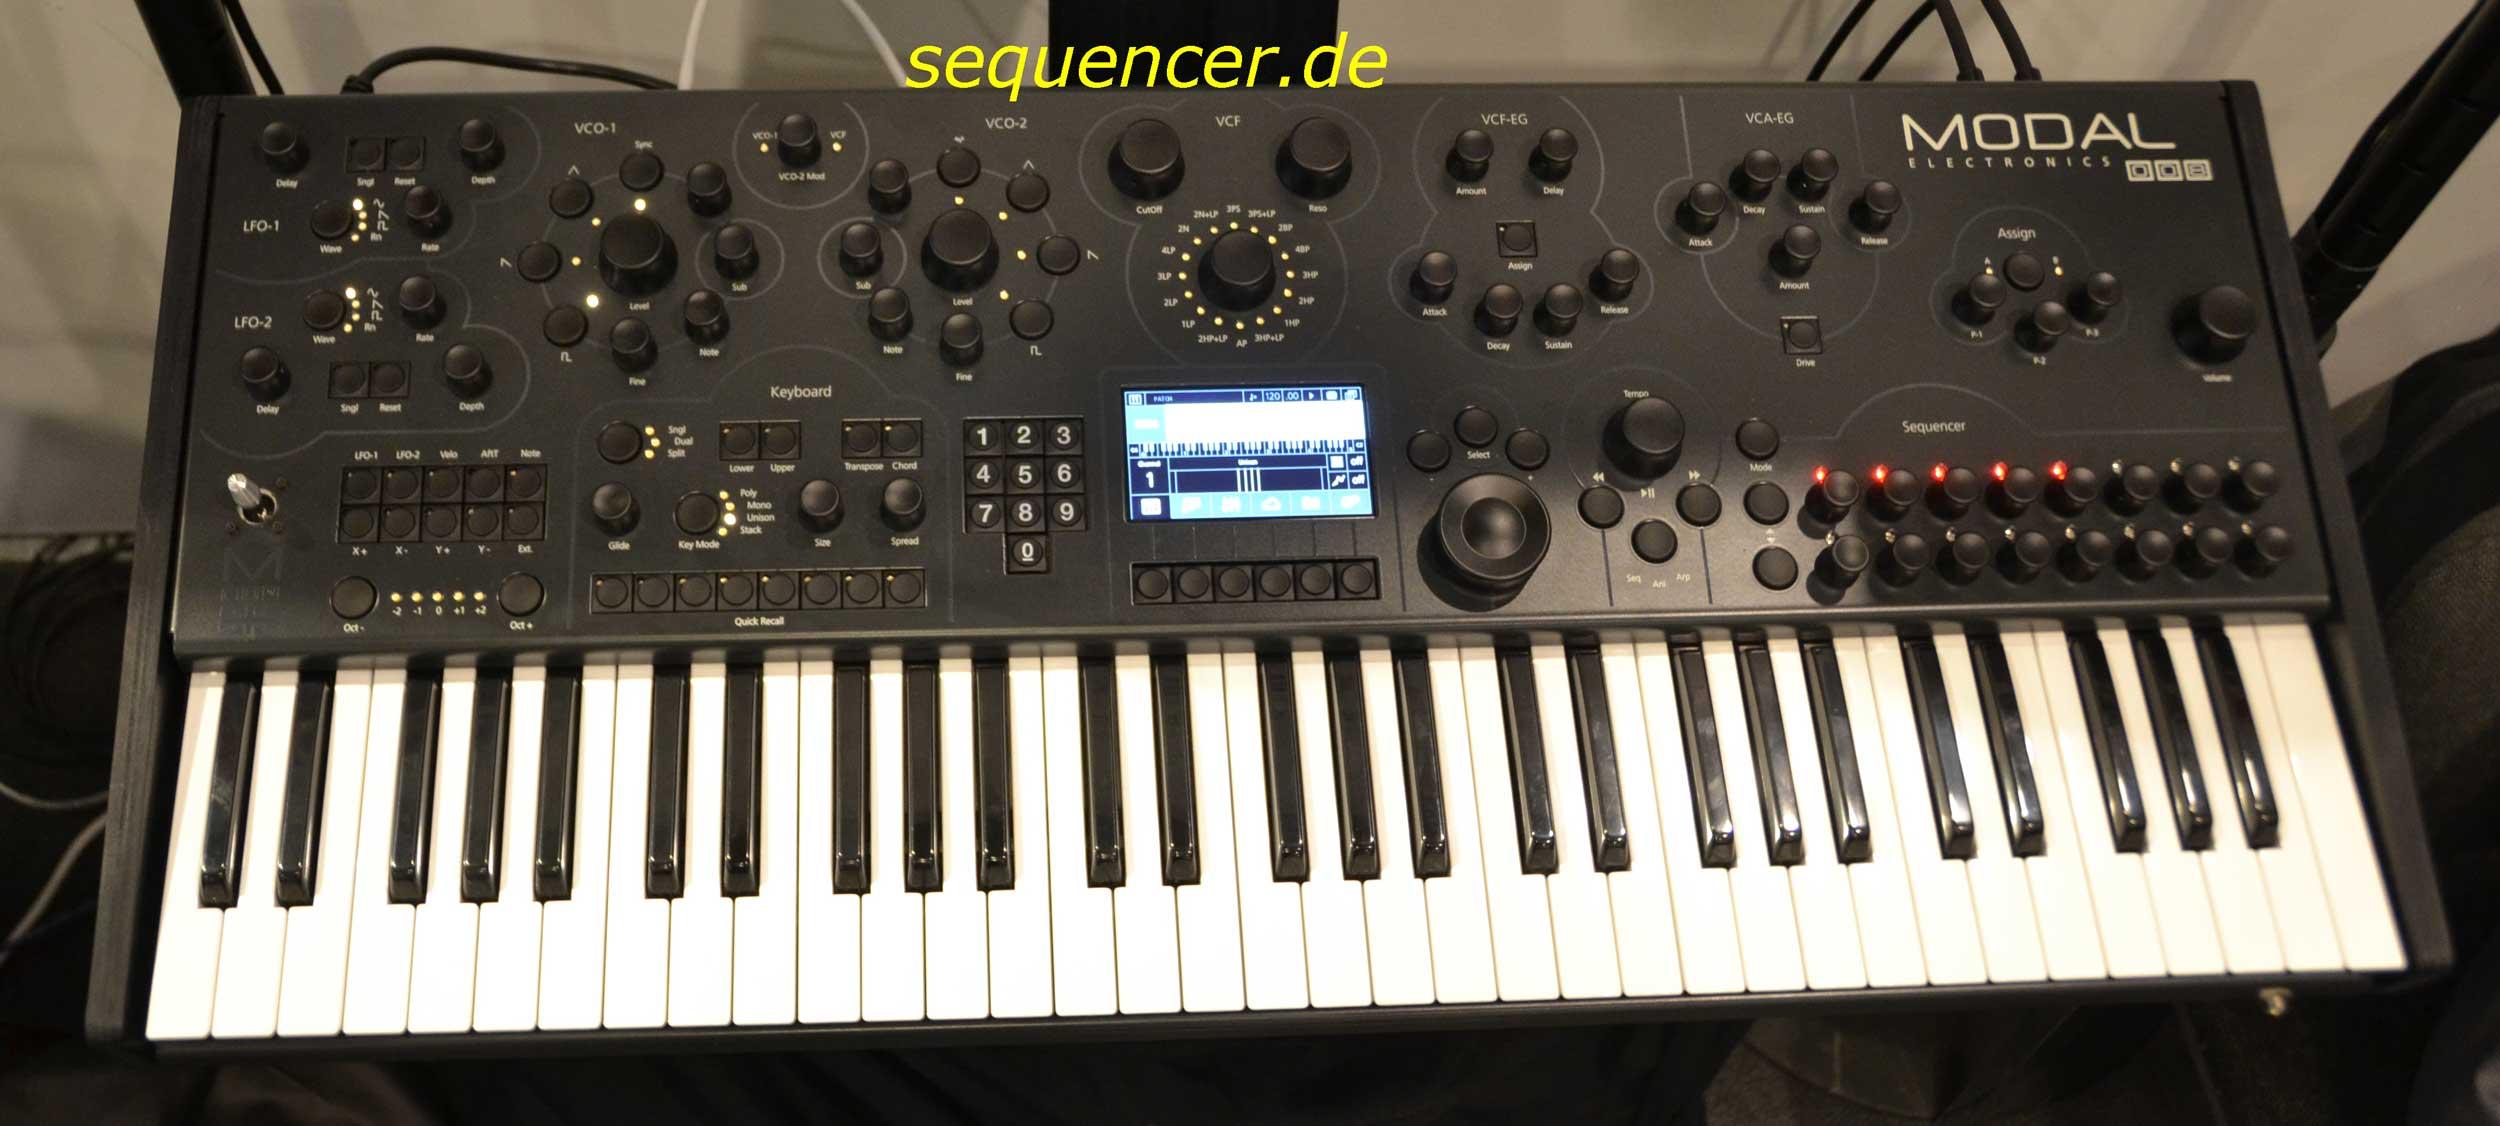 Modal 008 synthesizer